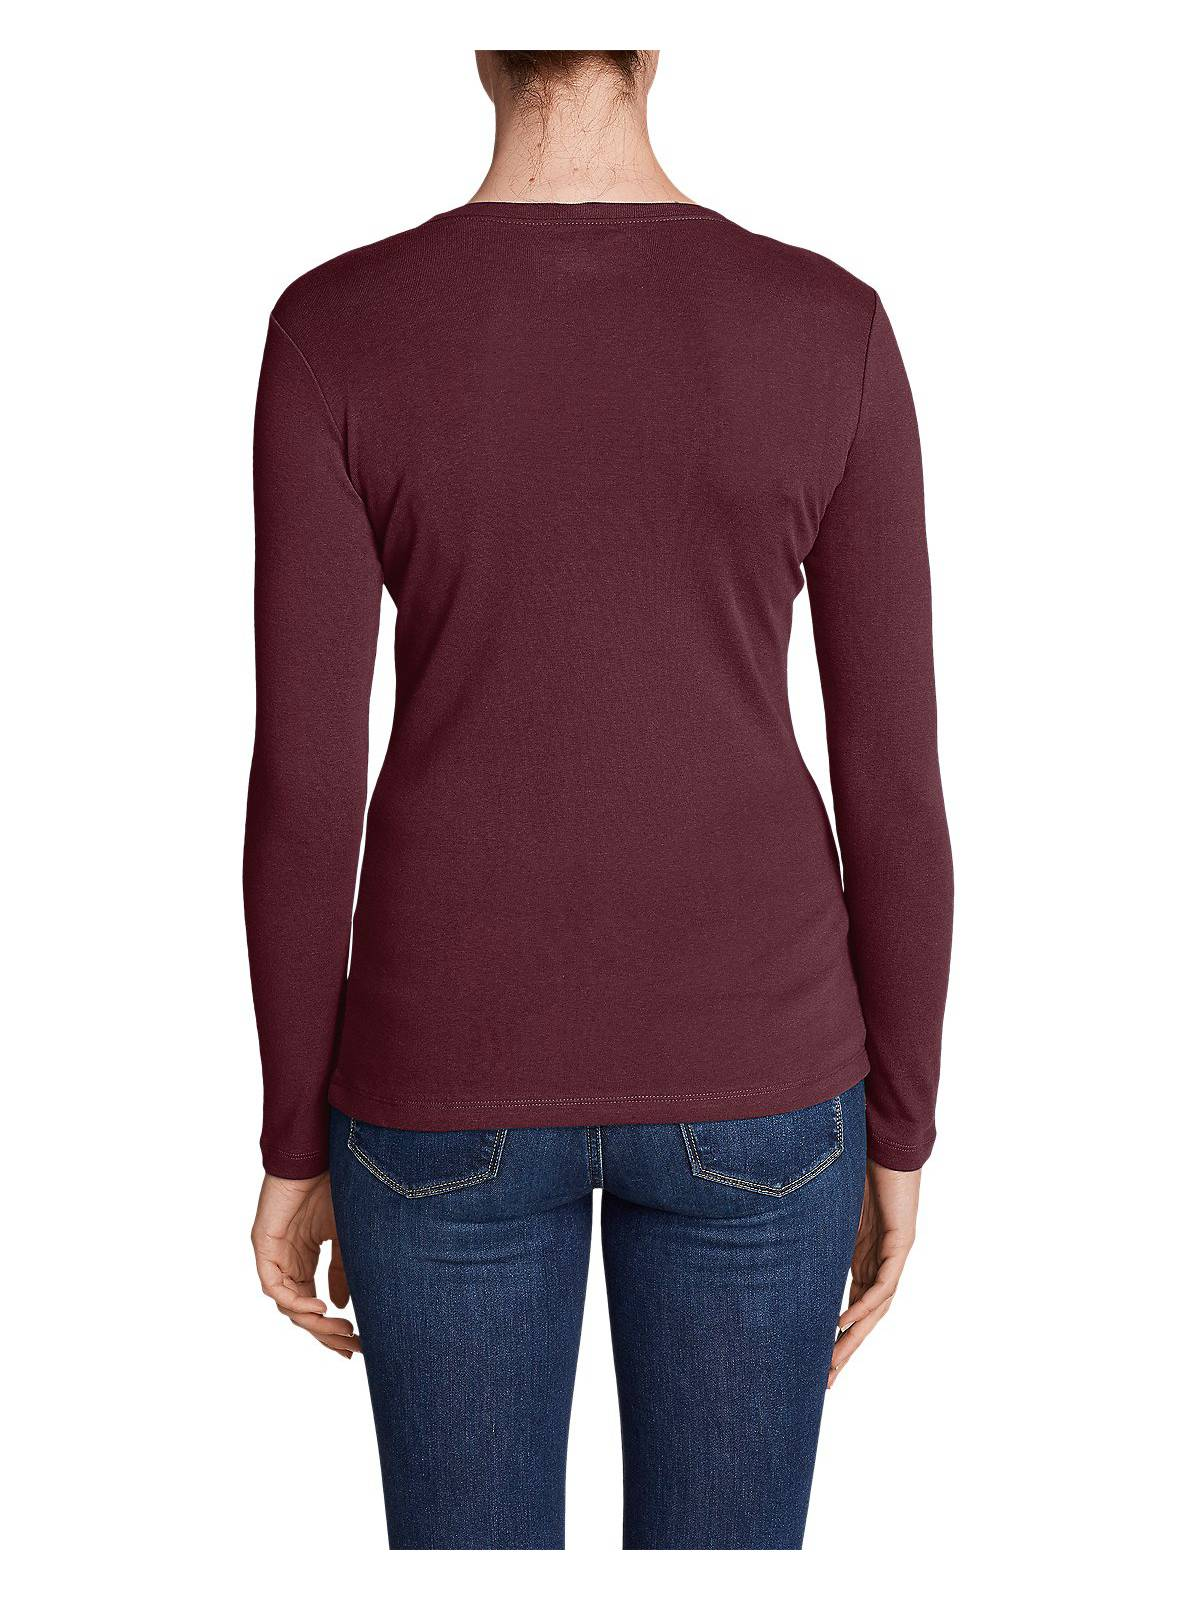 Eddie-Bauer-Women-039-s-Favorite-Long-Sleeve-Crewneck-T-Shirt thumbnail 40